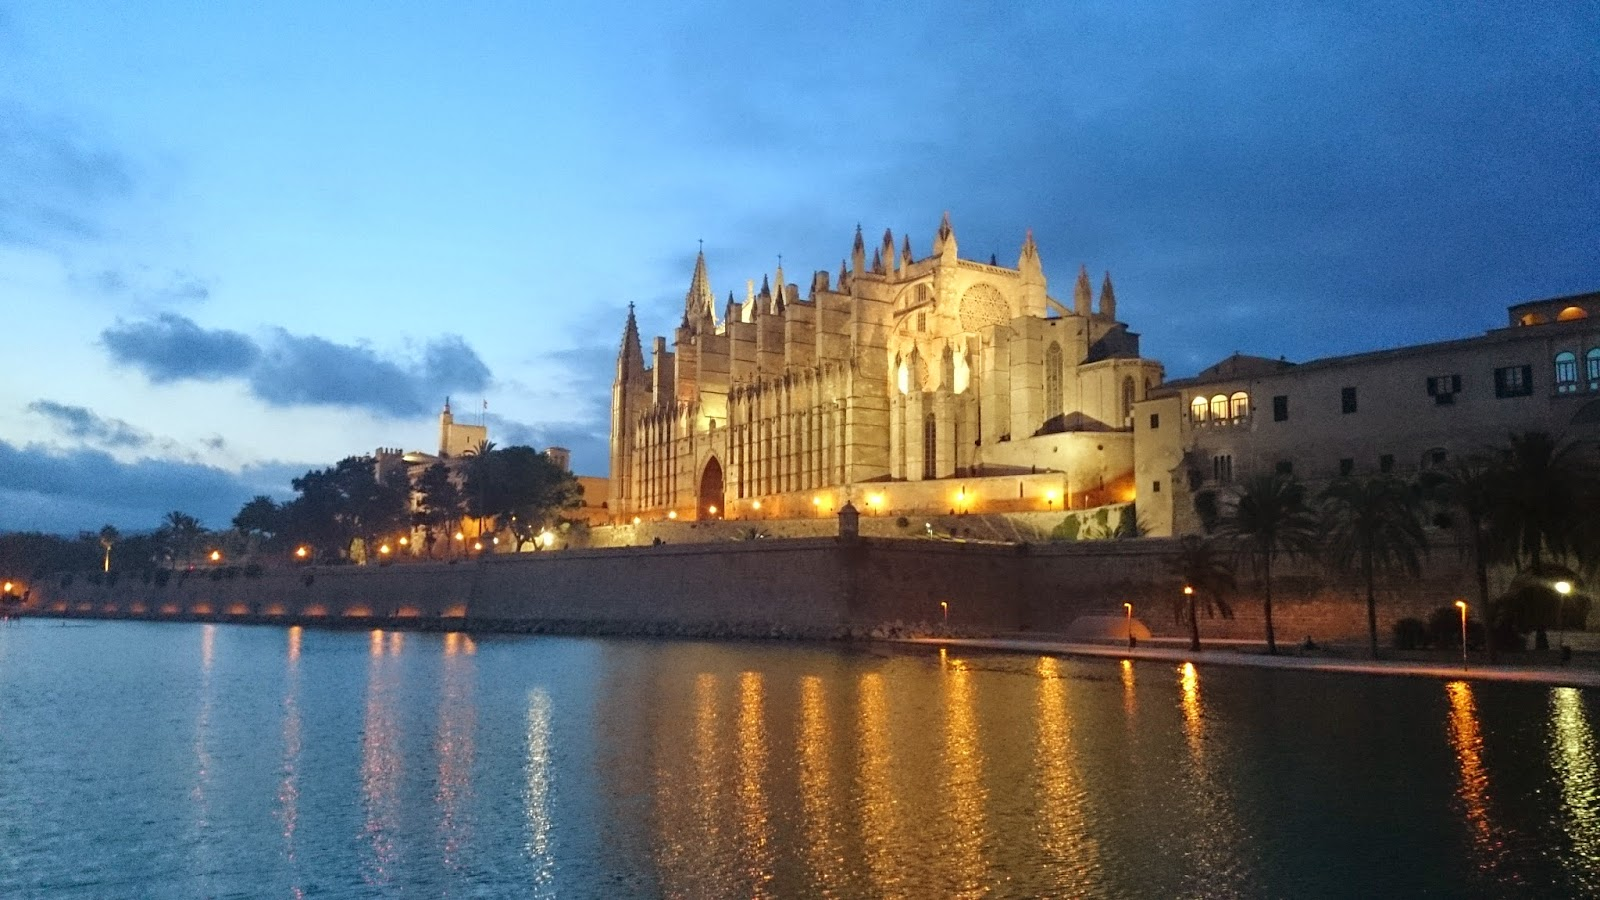 Excursiones a la Catedral de Palma de Mallorca